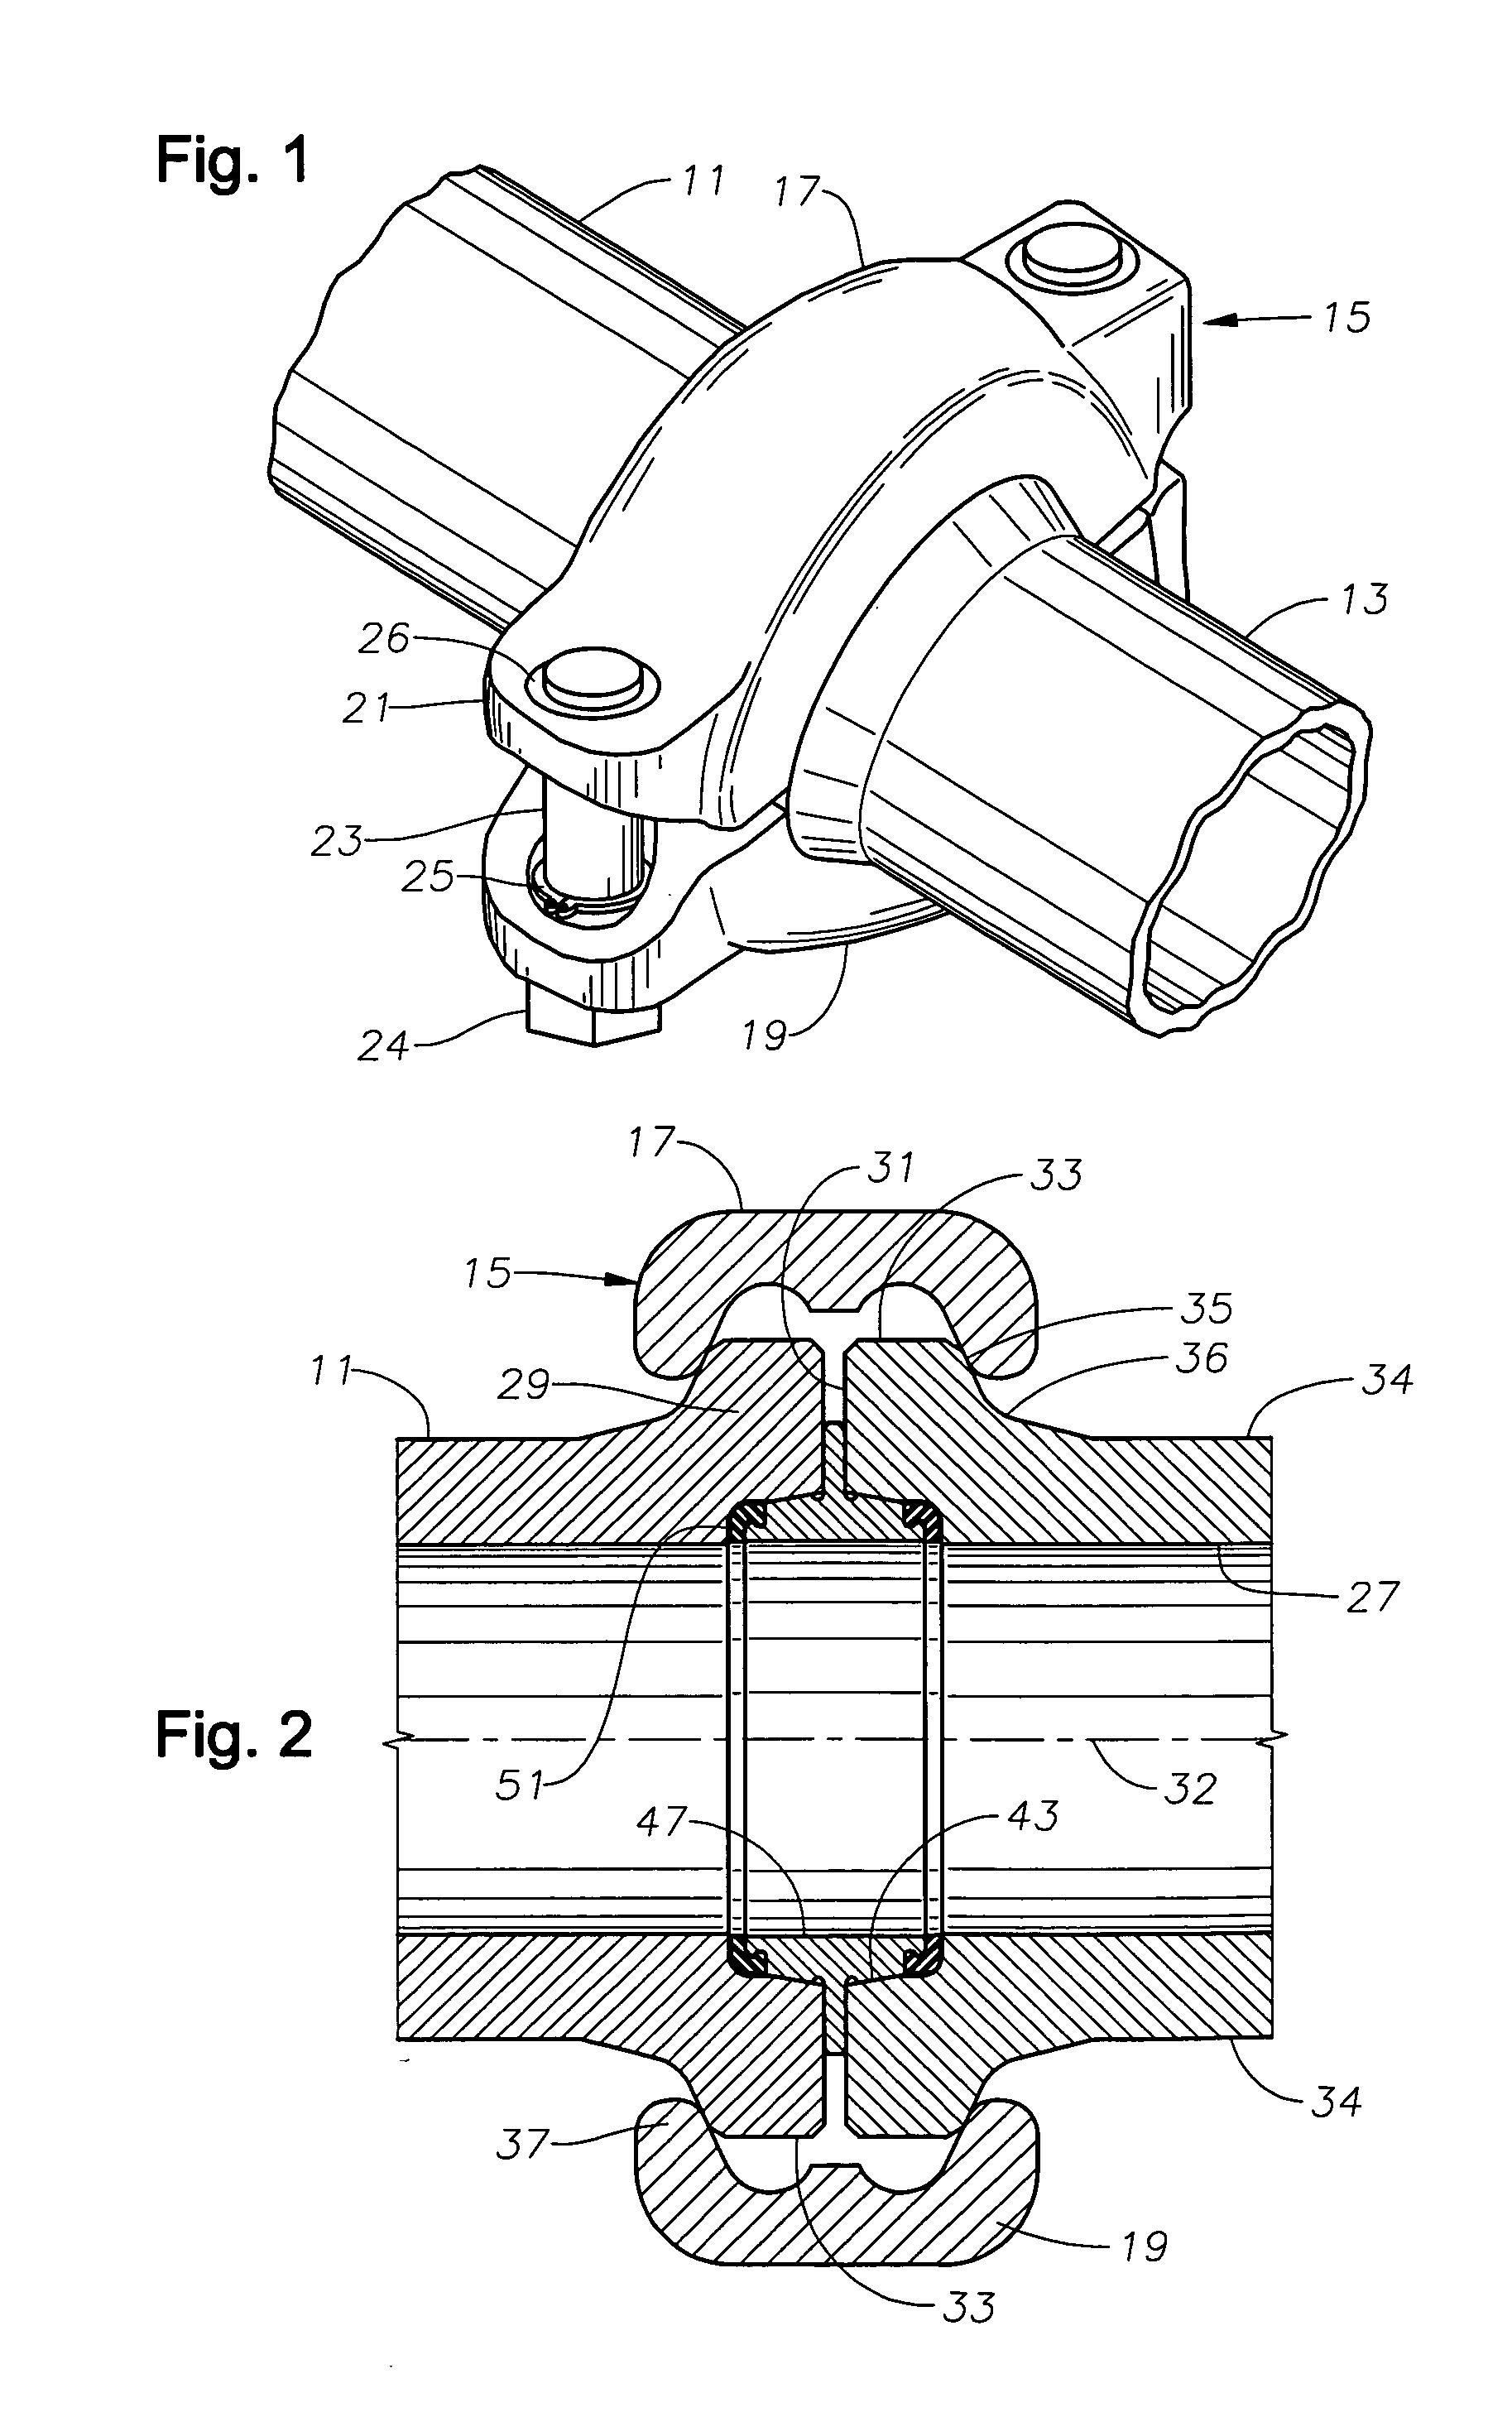 grayloc hub dimensions